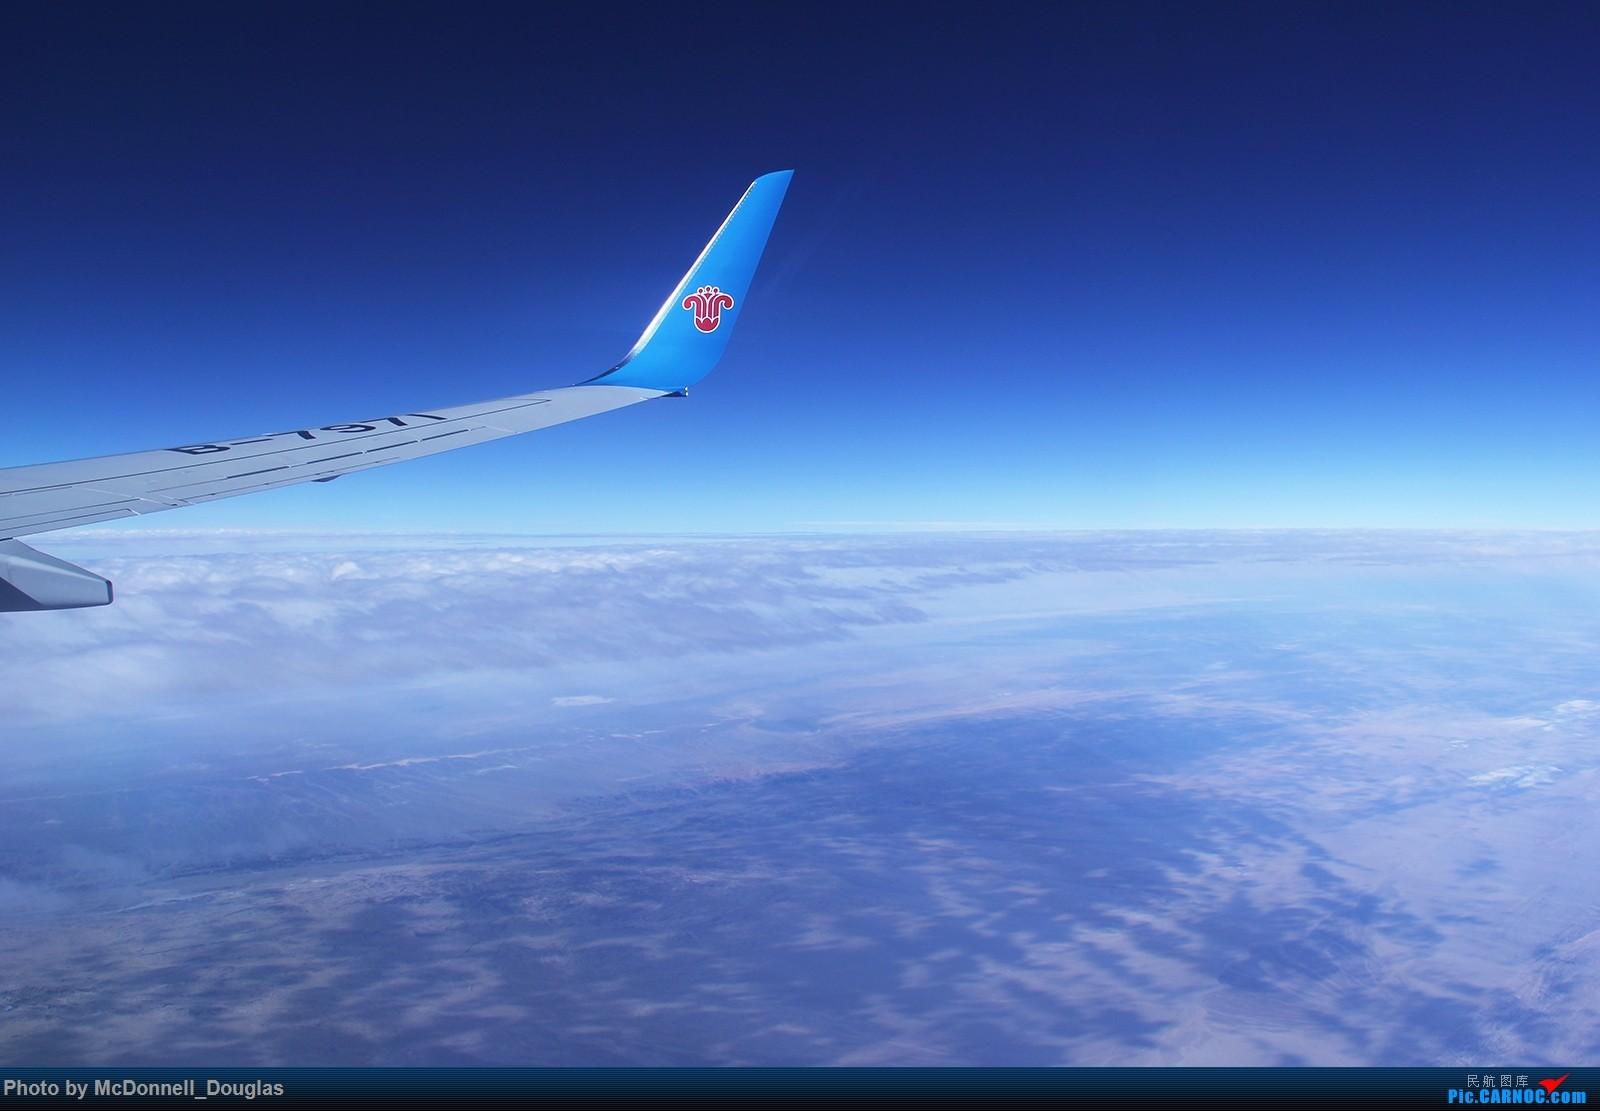 Re:[原创]【上海飞友会】【zc带你走天下(3)】再访祖辈年轻时工作的土地,父母年少时生活戈壁,跨越大半个中国去看新疆,回程小游蓉城(下) BOEING 737-81B B-7971